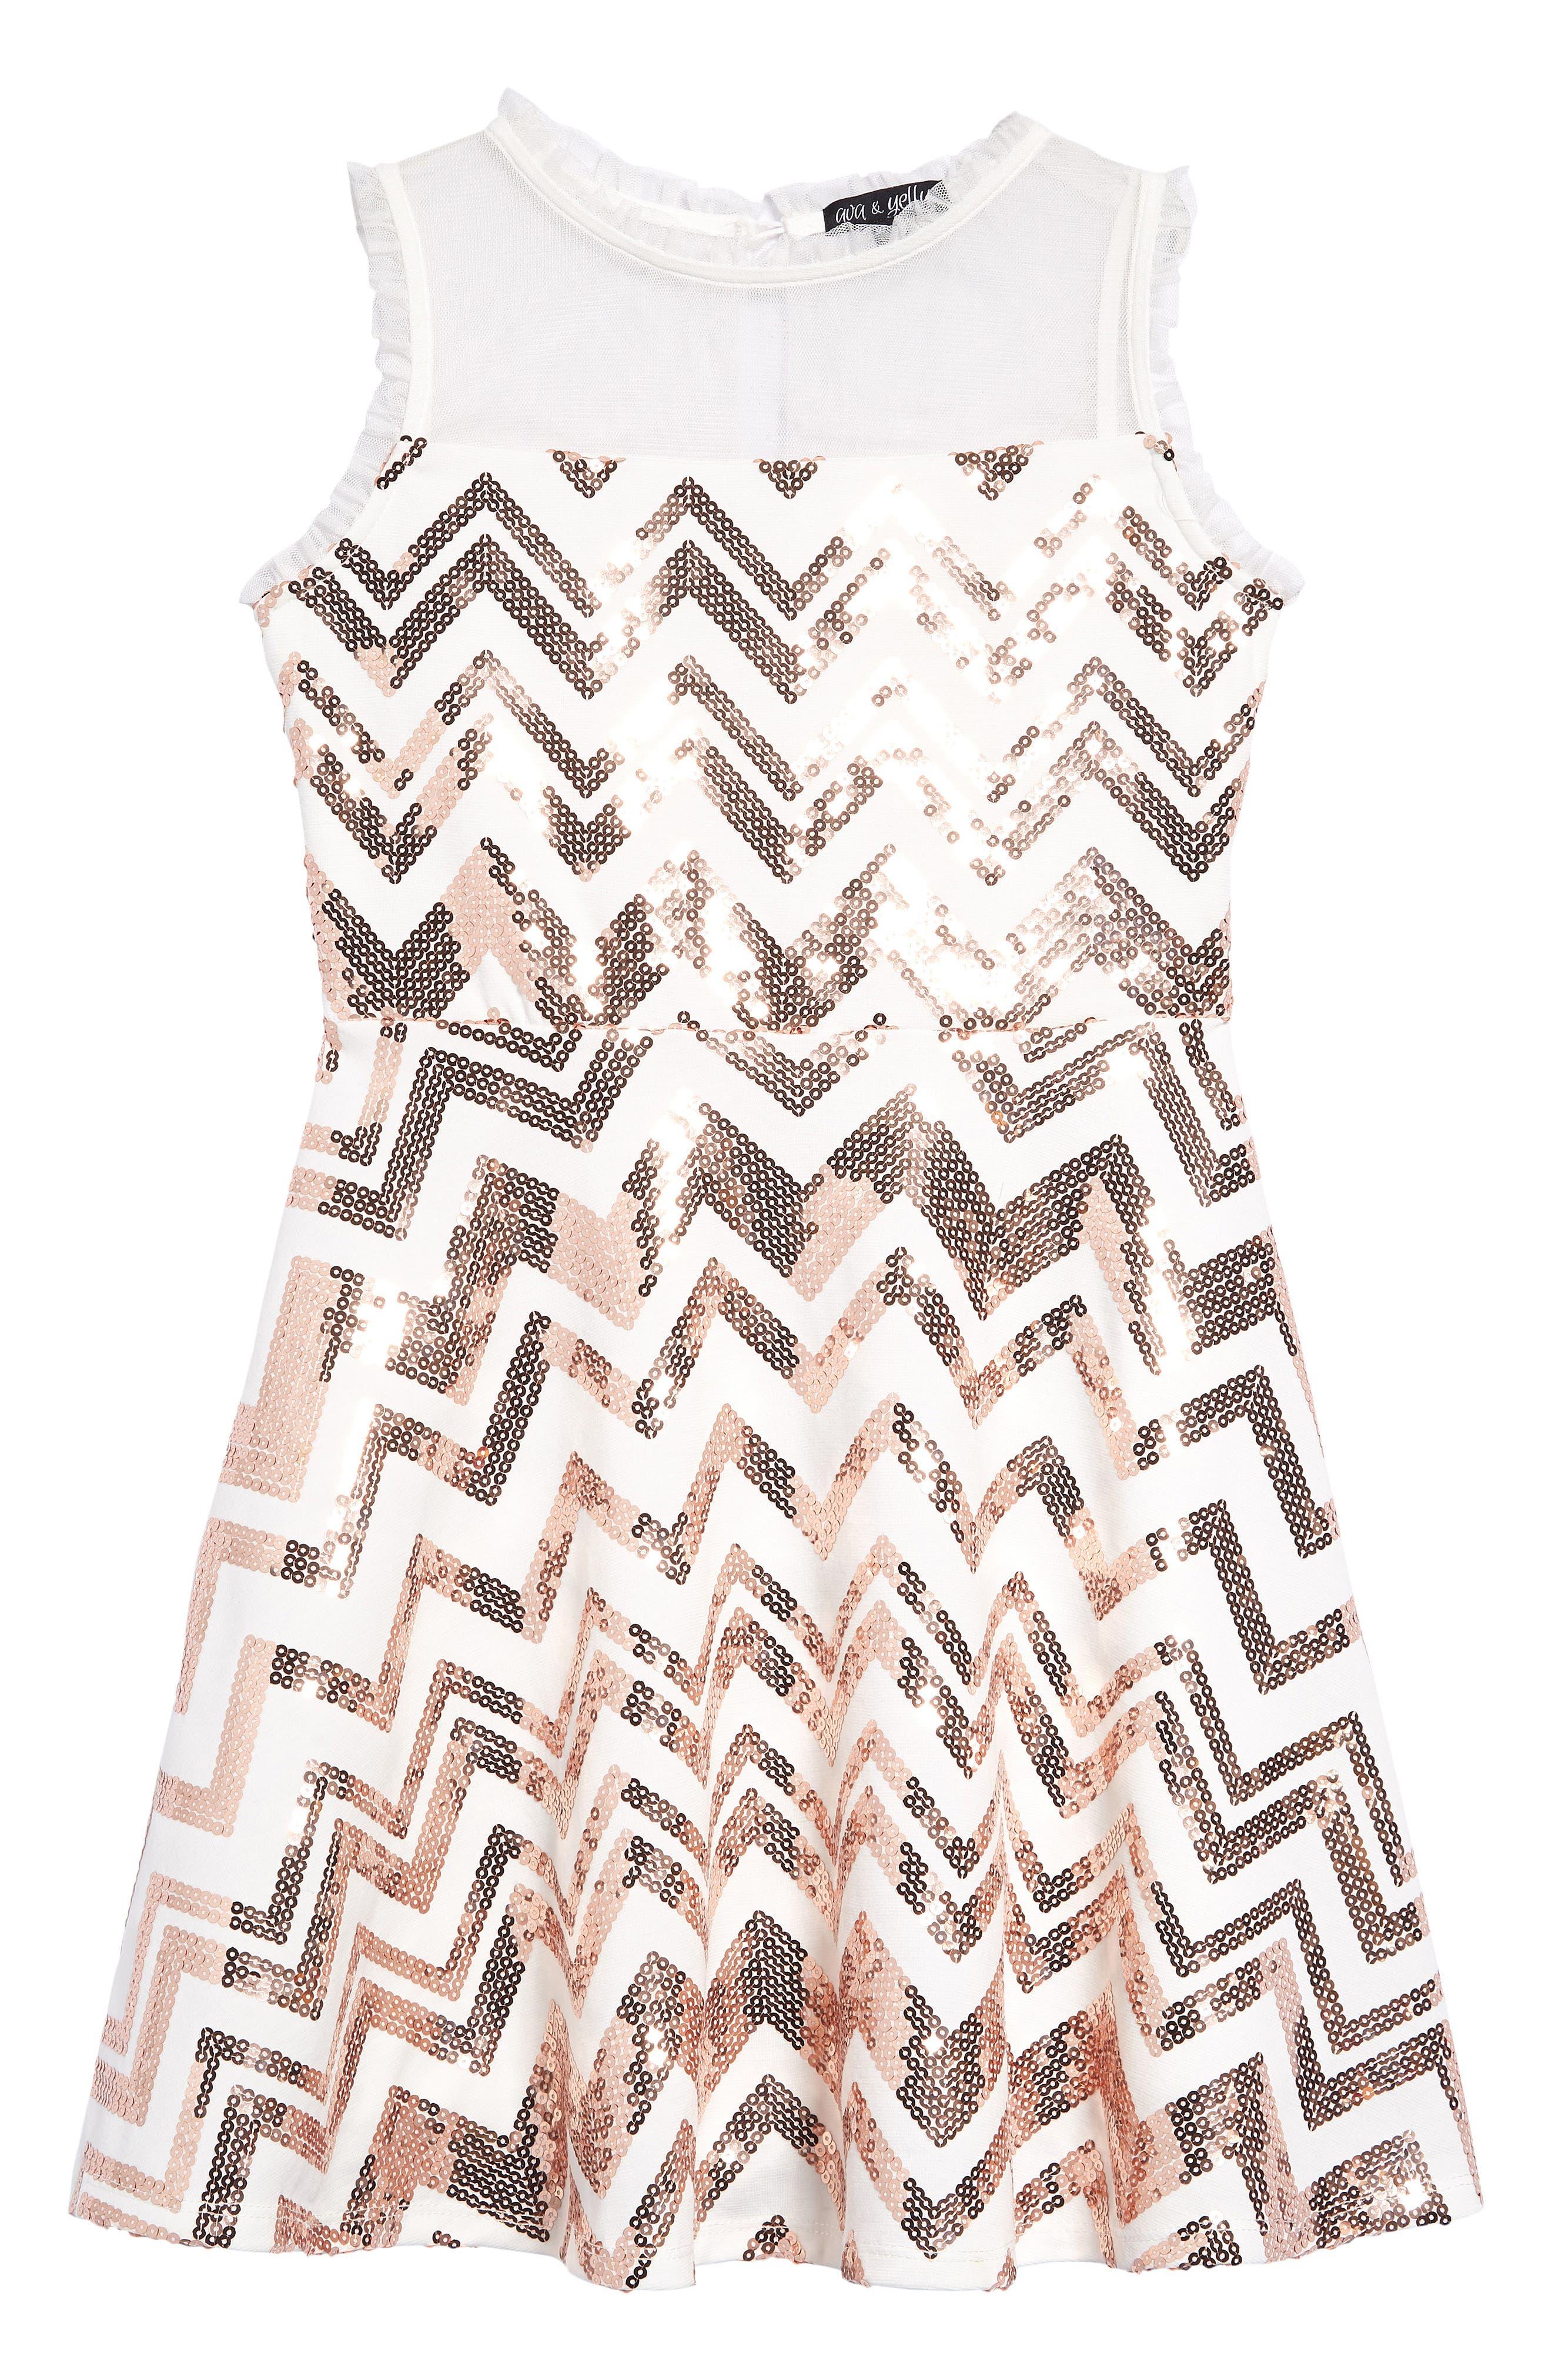 1920s Children Fashions: Girls, Boys, Baby Costumes Girls Ava  Yelly Zigzag Sequin Illusion Neck Dress $33.60 AT vintagedancer.com